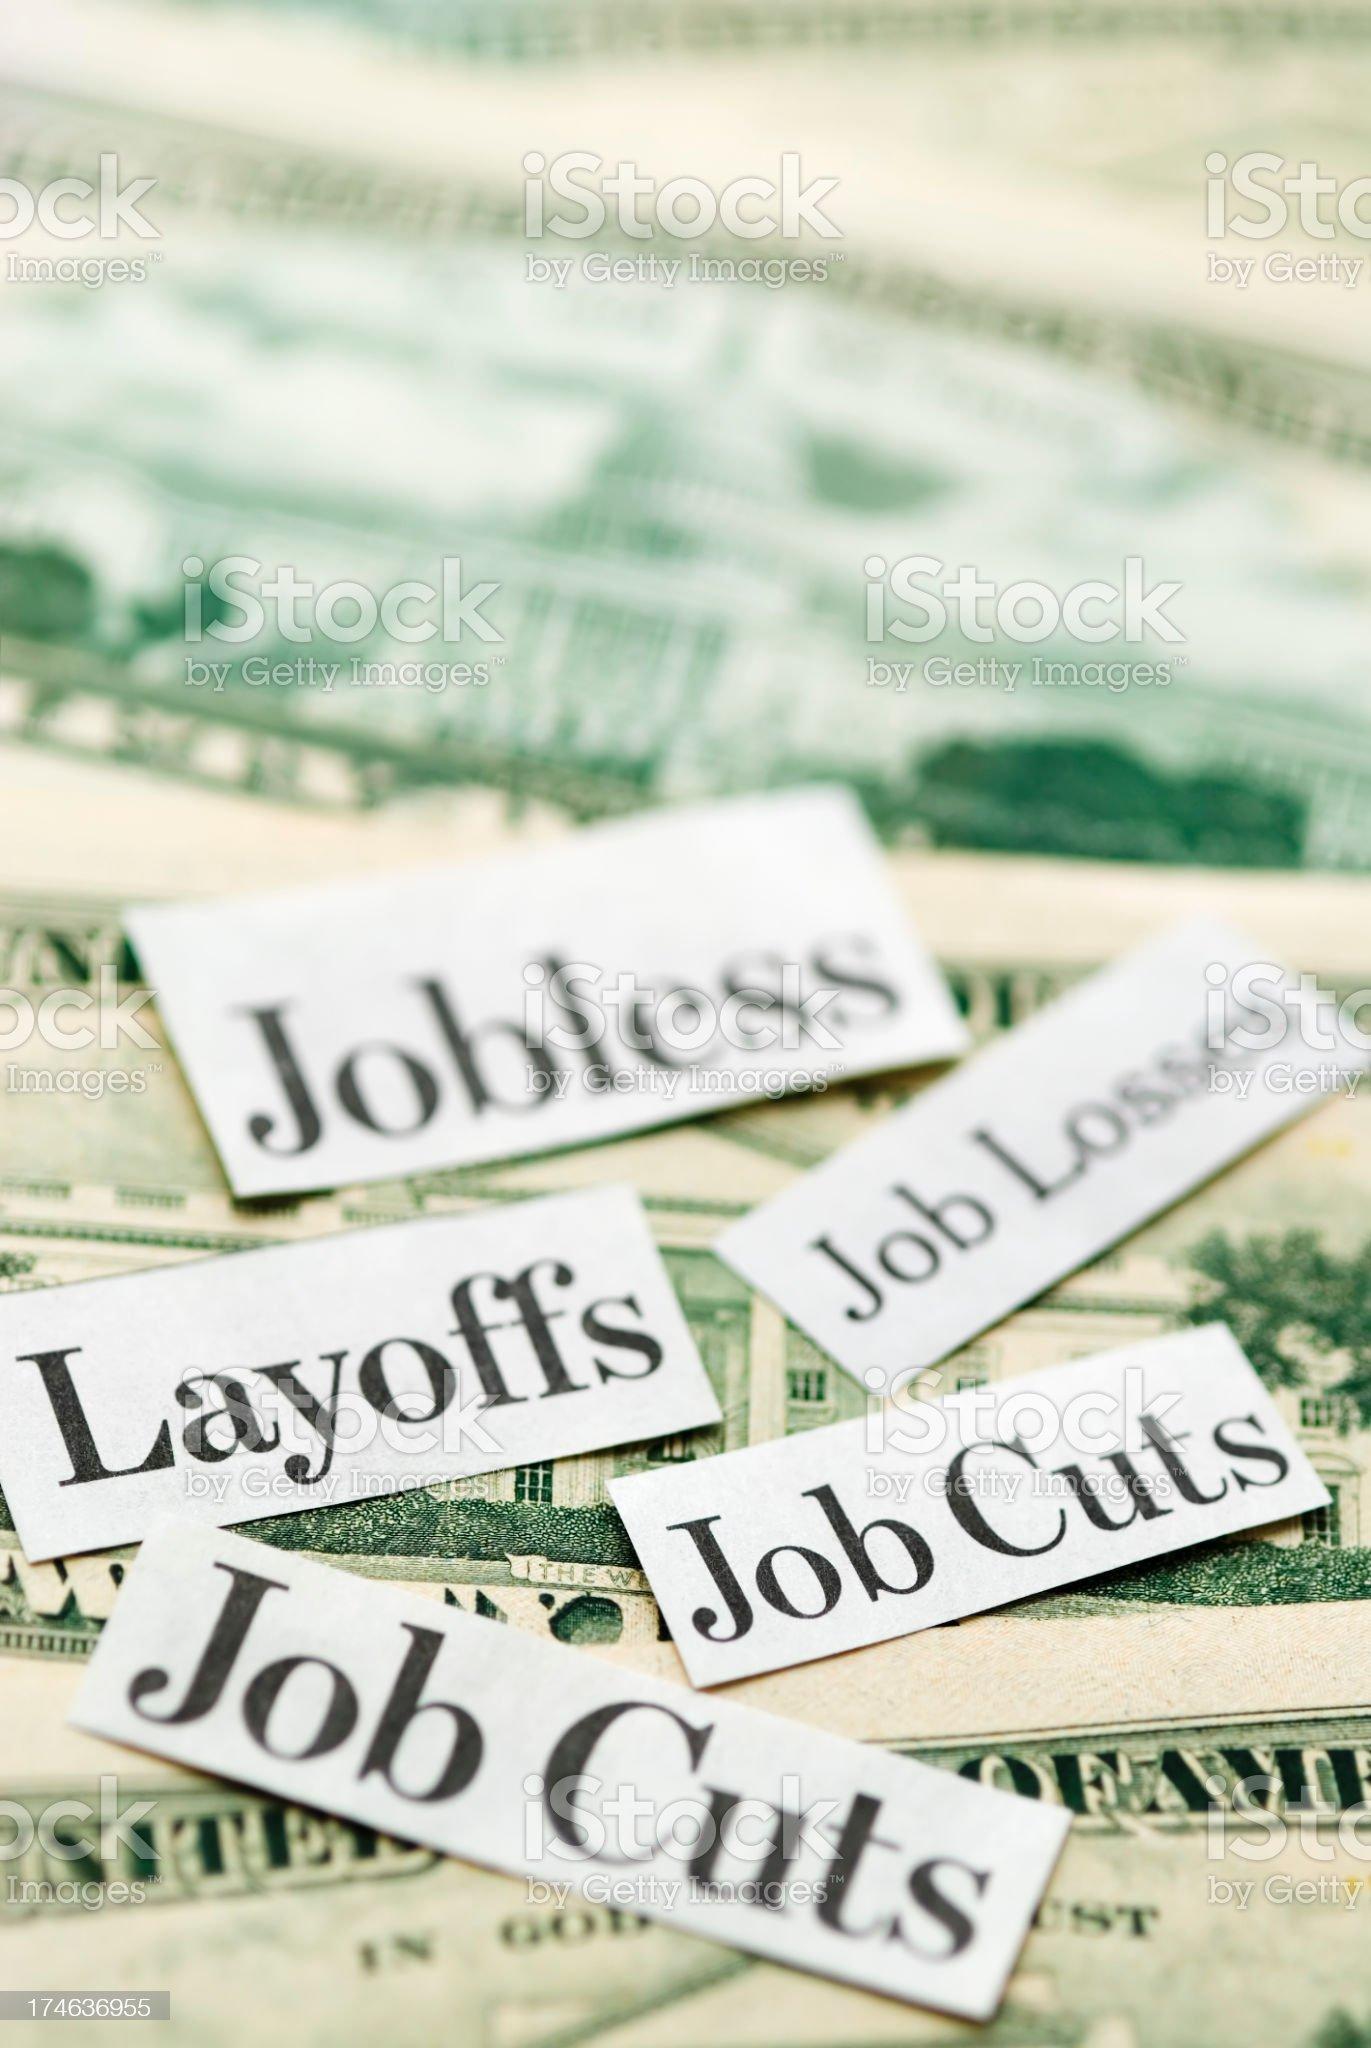 Job Cuts, Jobless, Layoffs - IV royalty-free stock photo